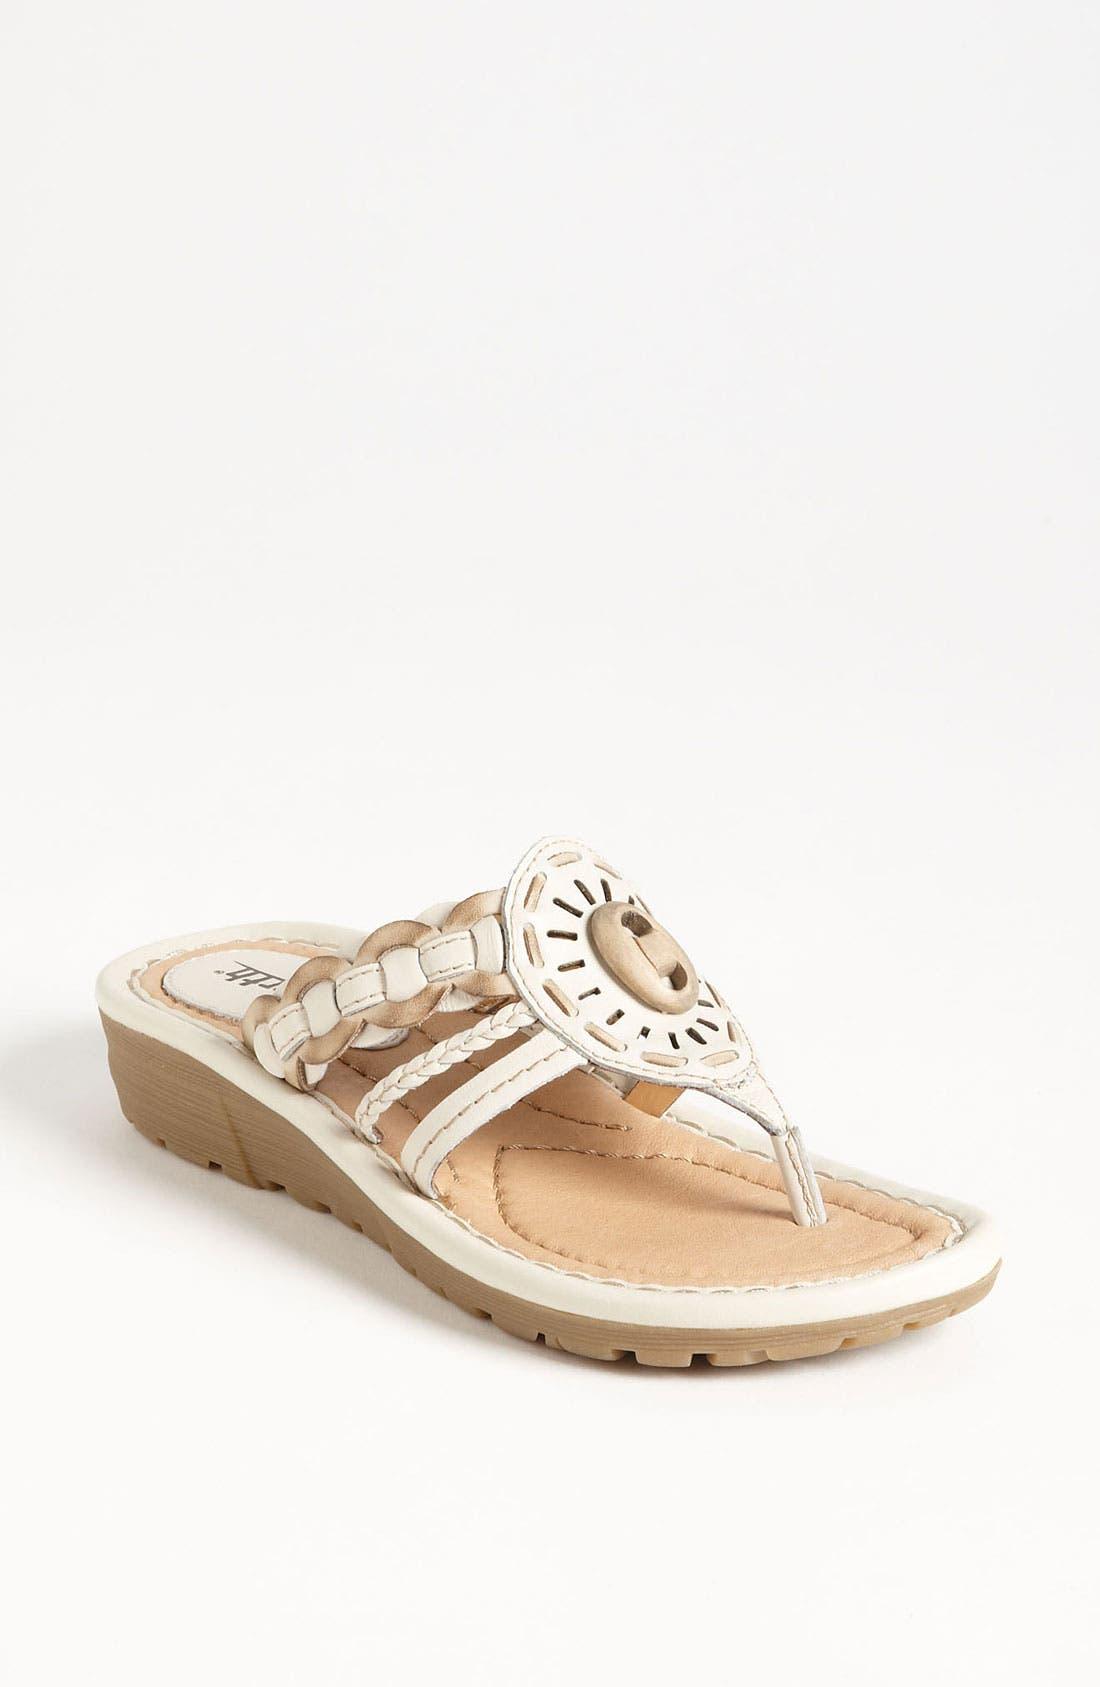 Main Image - Earth® 'Gale' Sandal